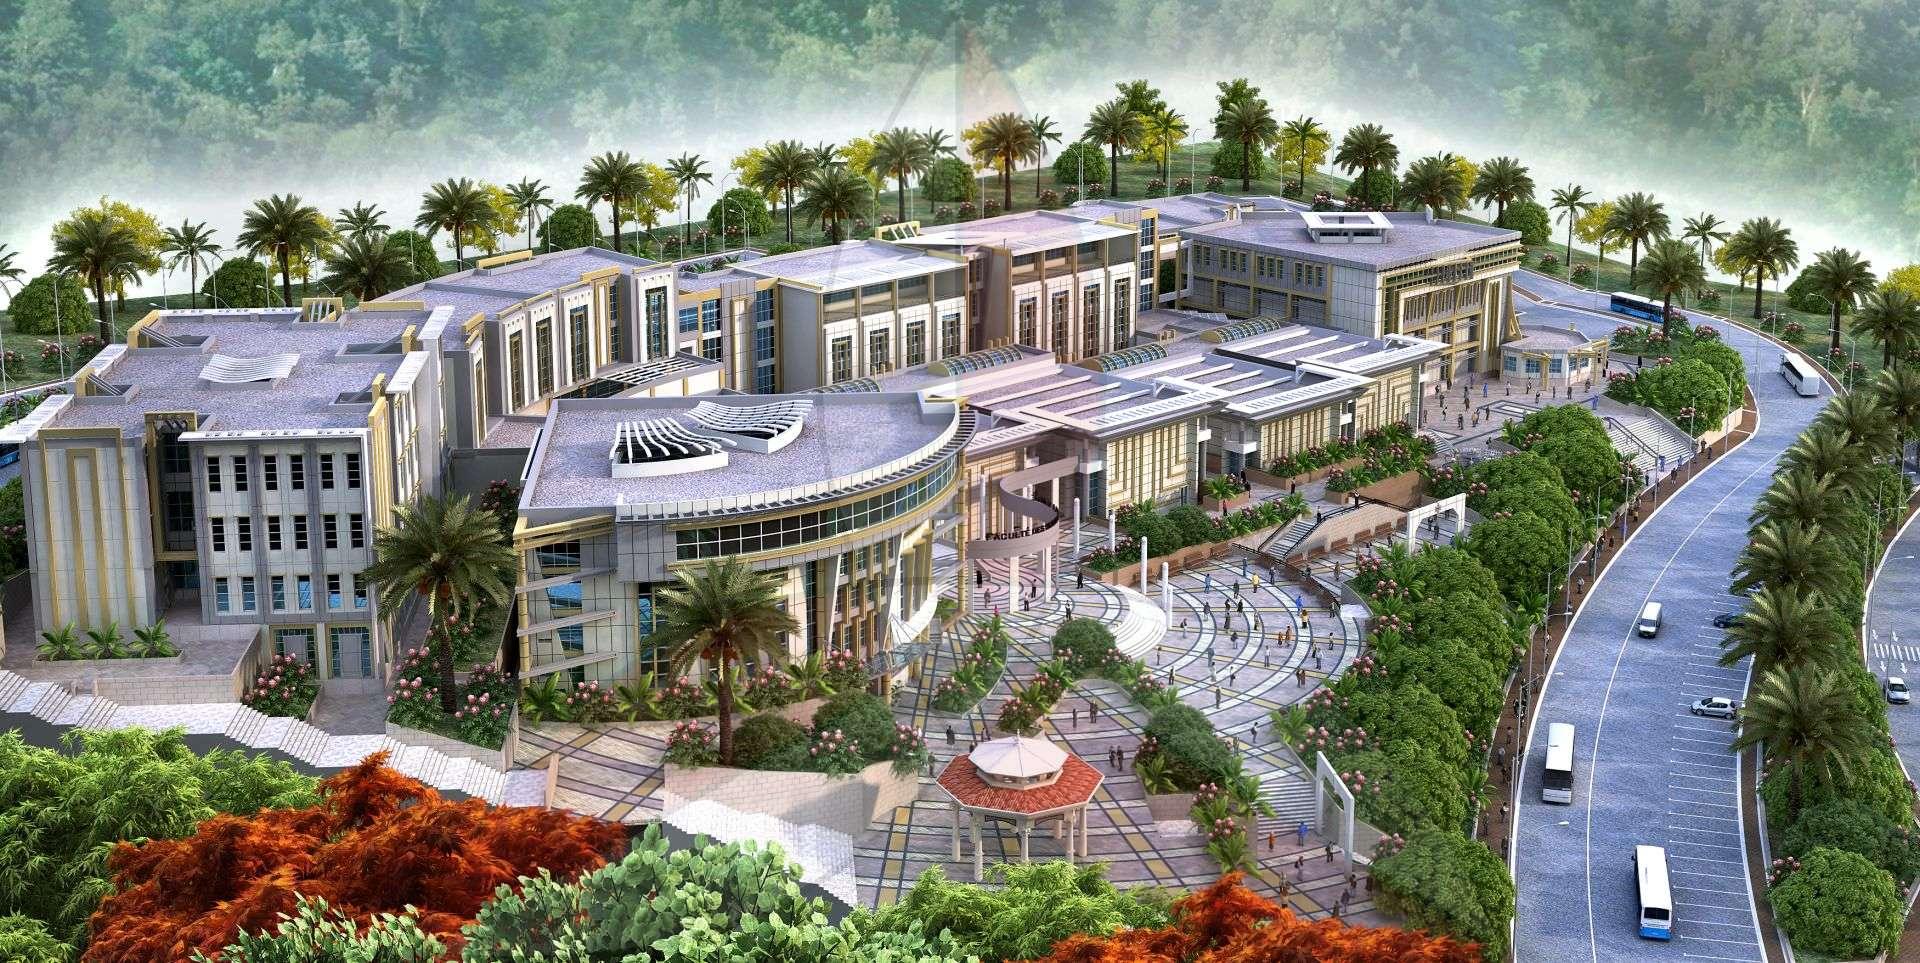 Algeria Guelma University Campus Planning Services